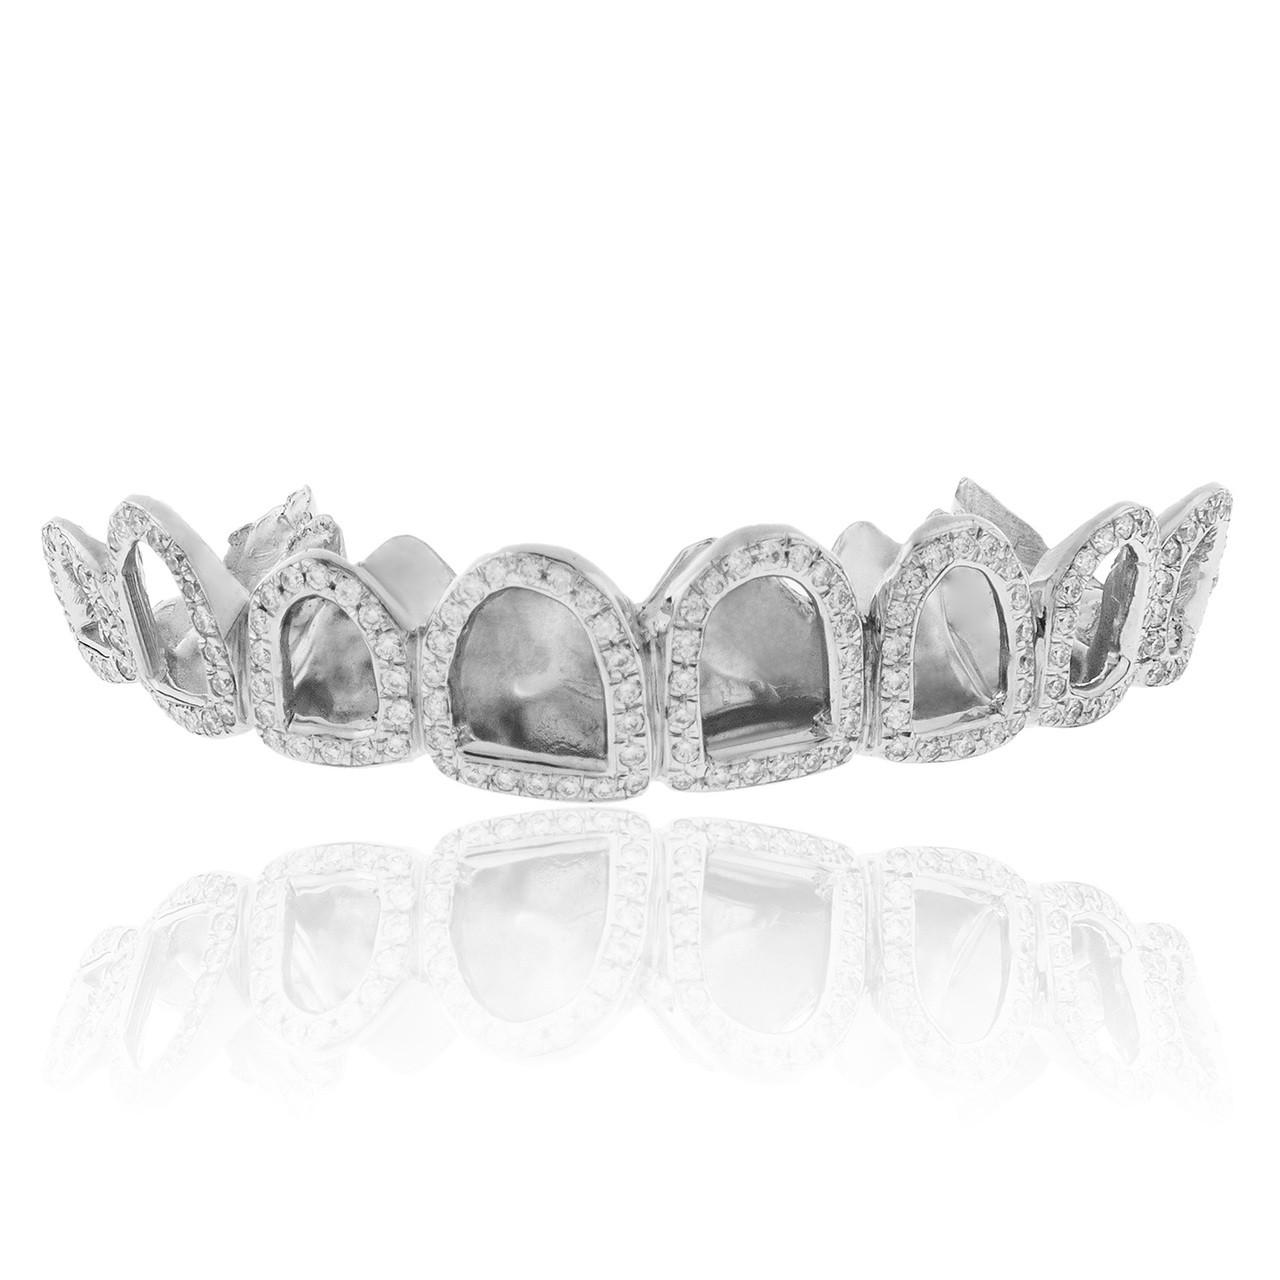 10k White Gold 1.5ct Diamond Top 8 Window Grill - Shyne Jewelers 0740e35661